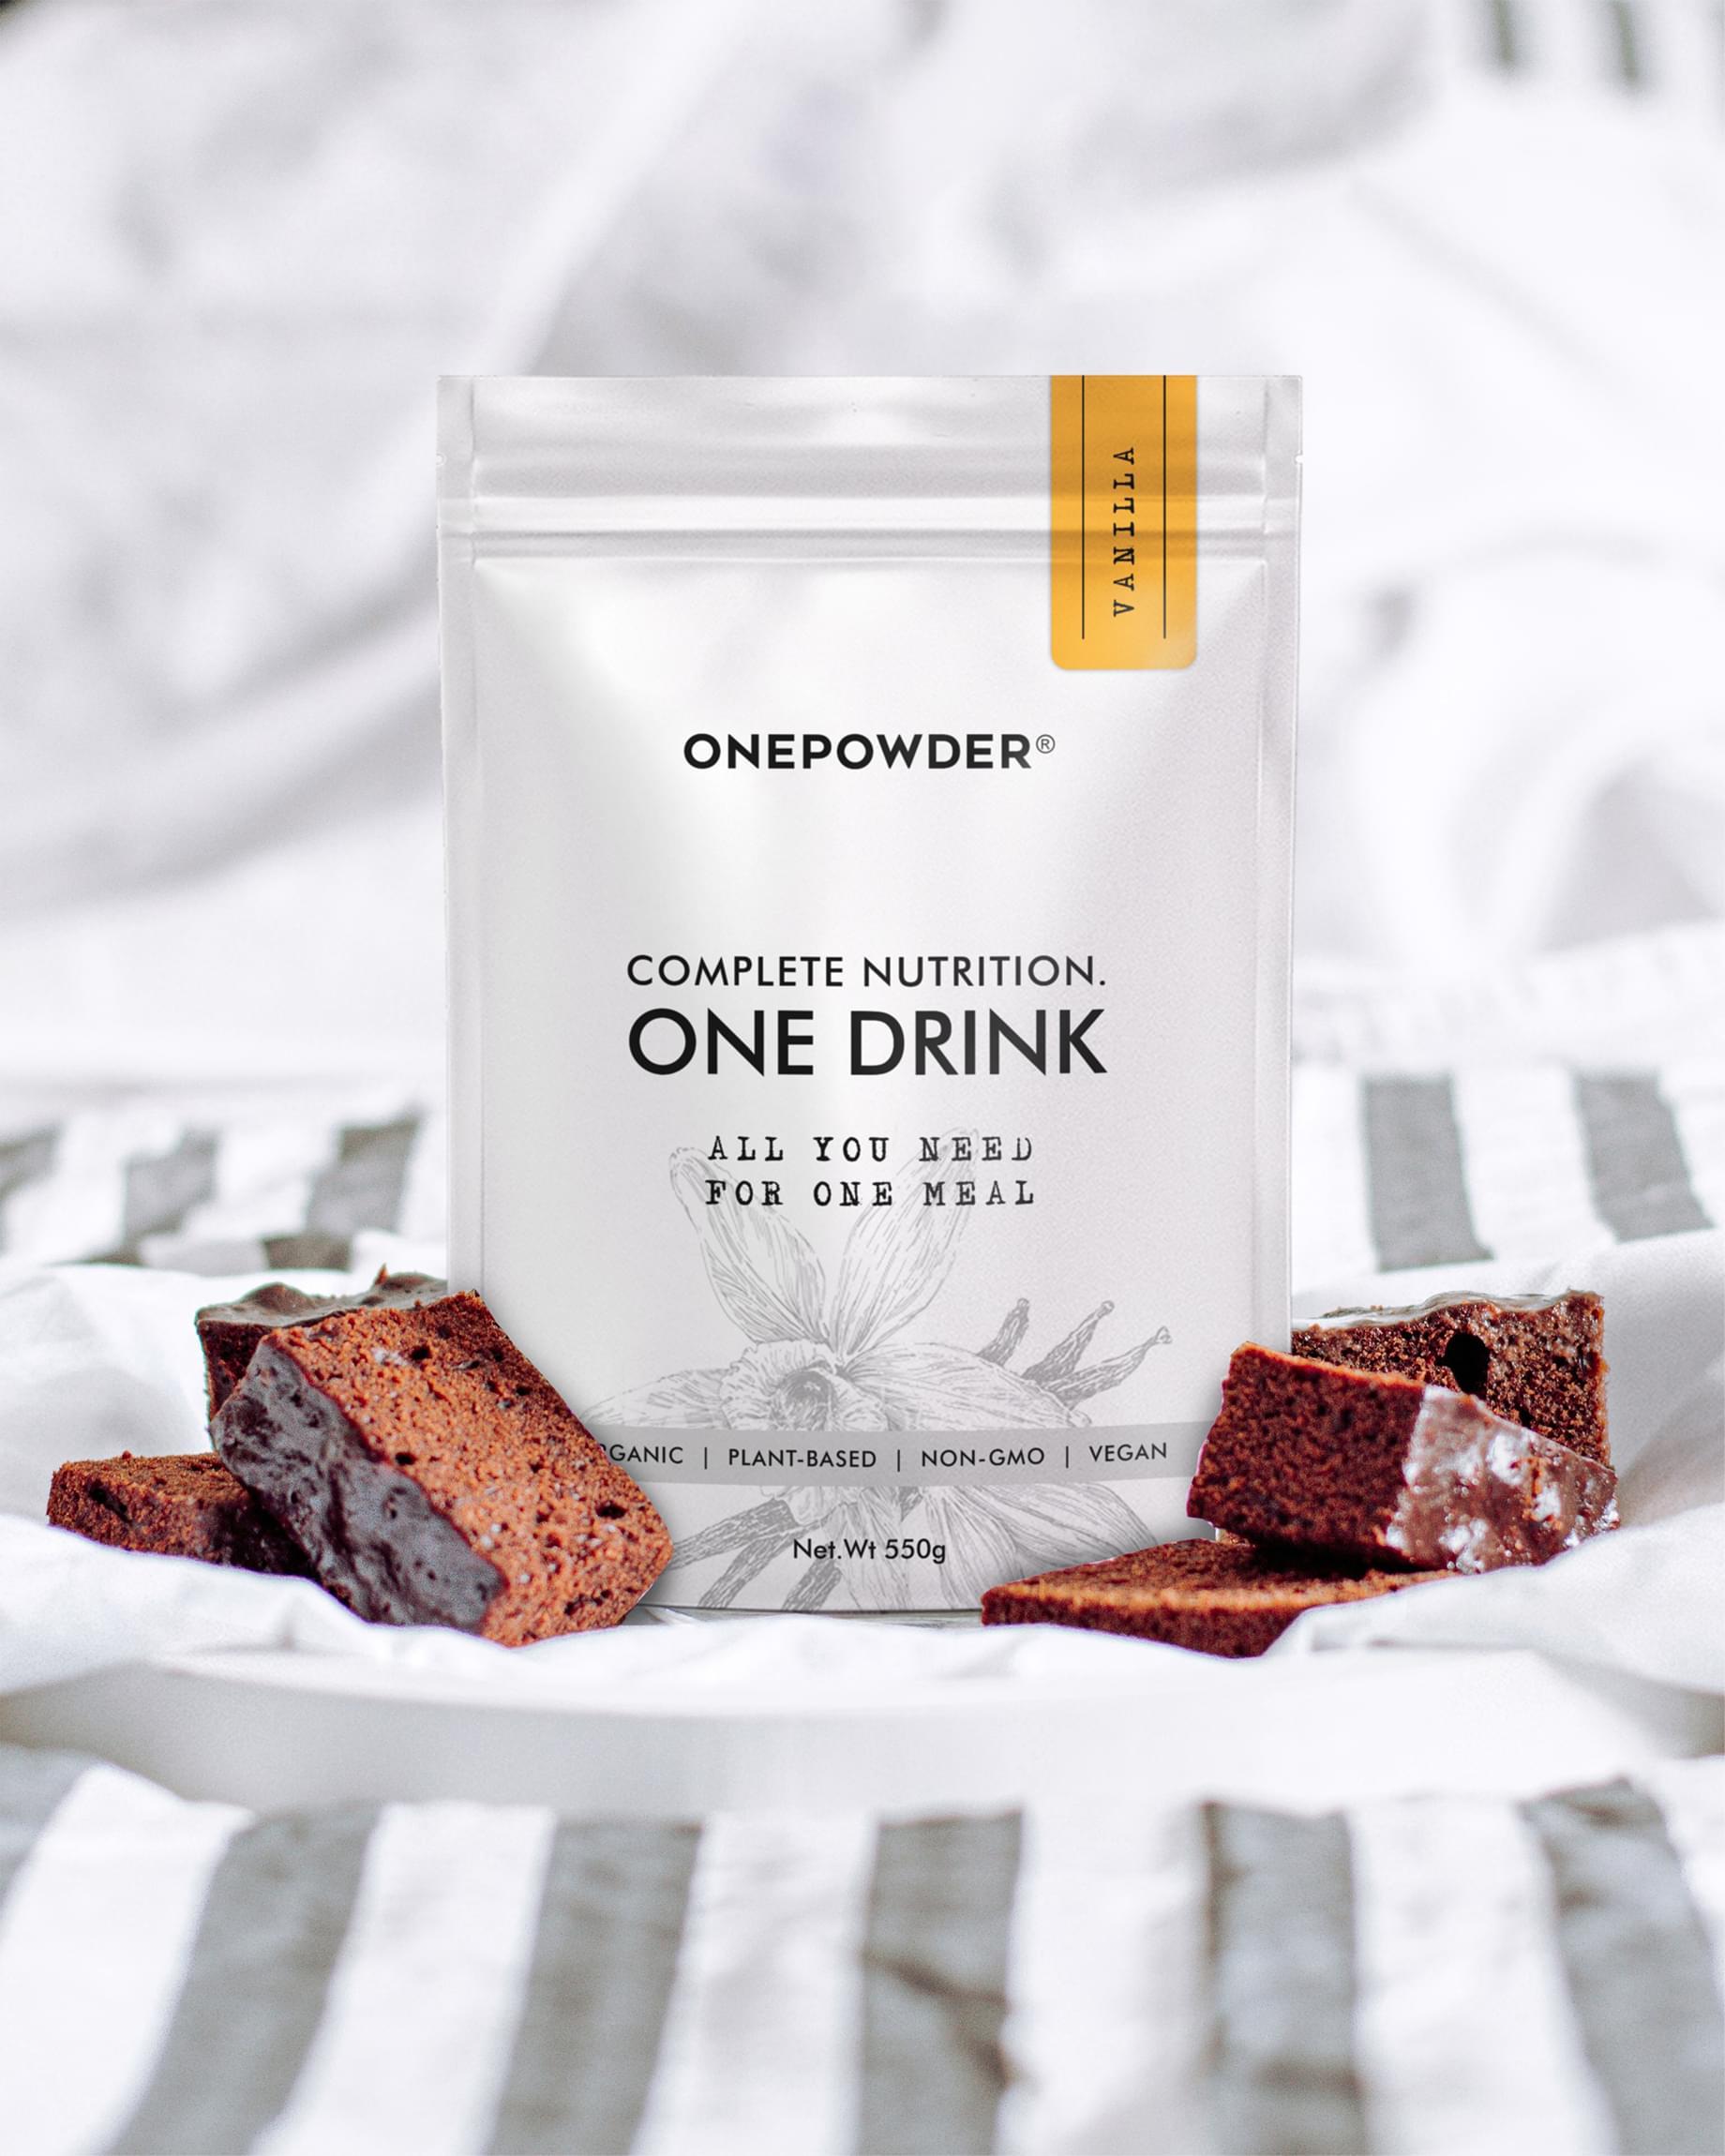 OnePowder Packaging